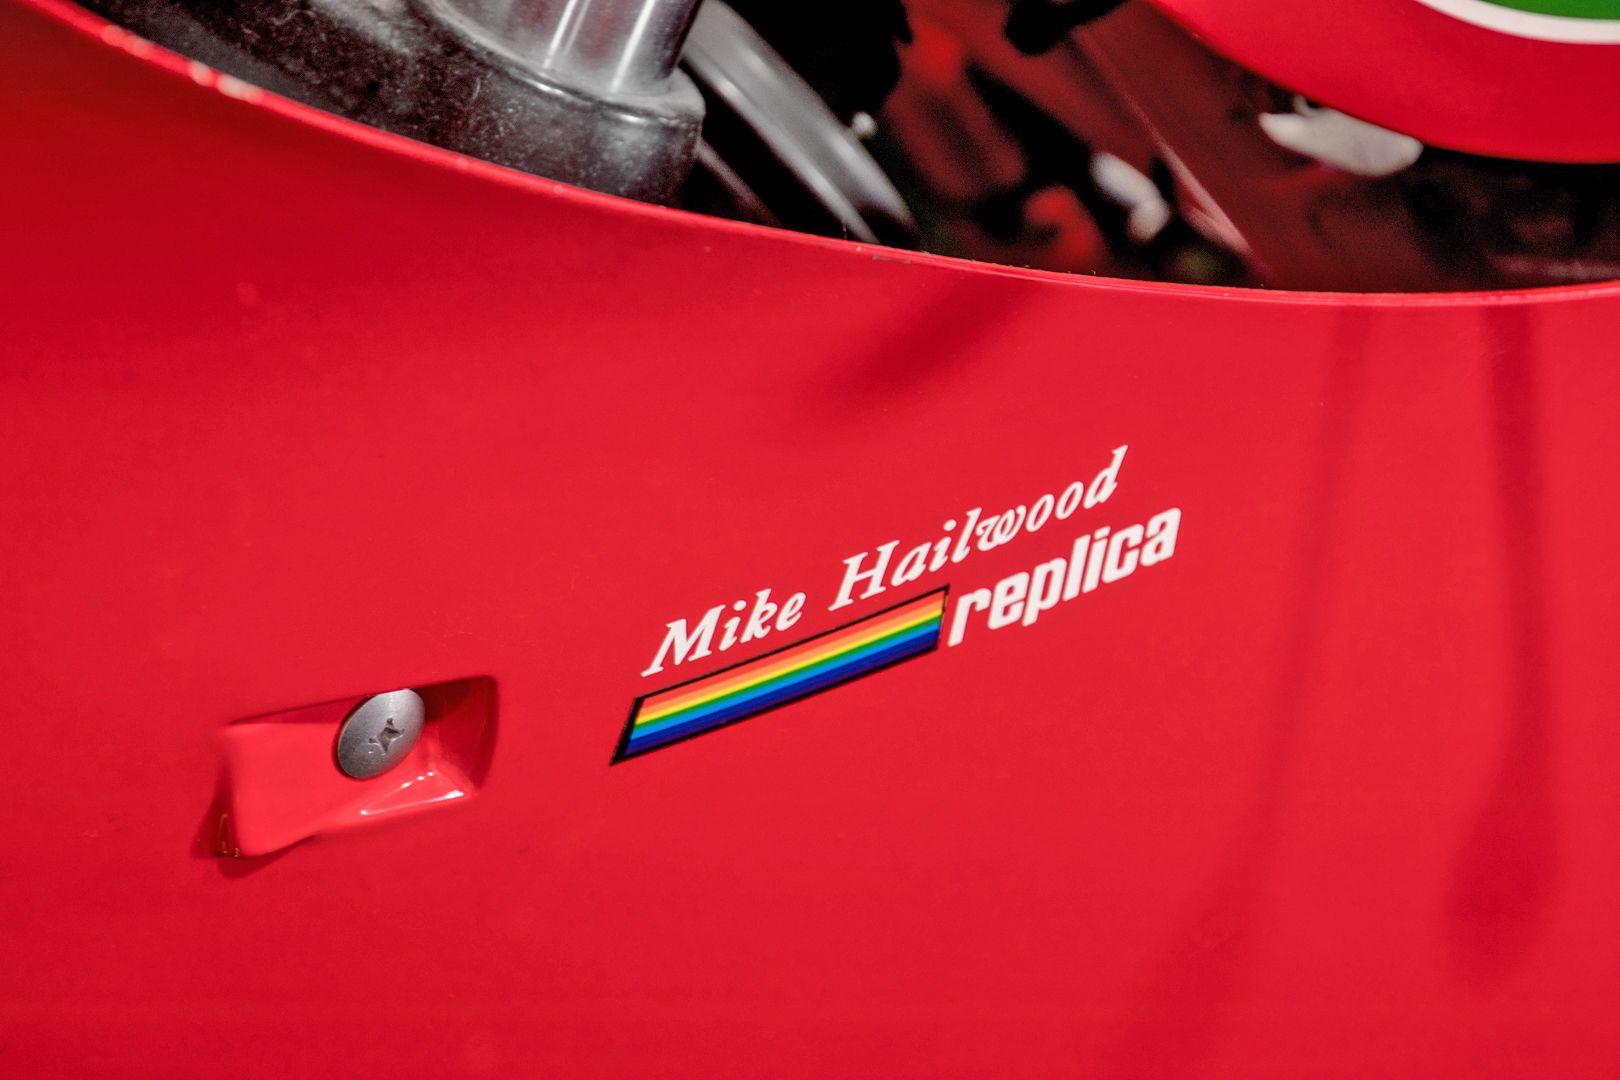 1984 Ducati 900 Mike Hailwood Replica 81565